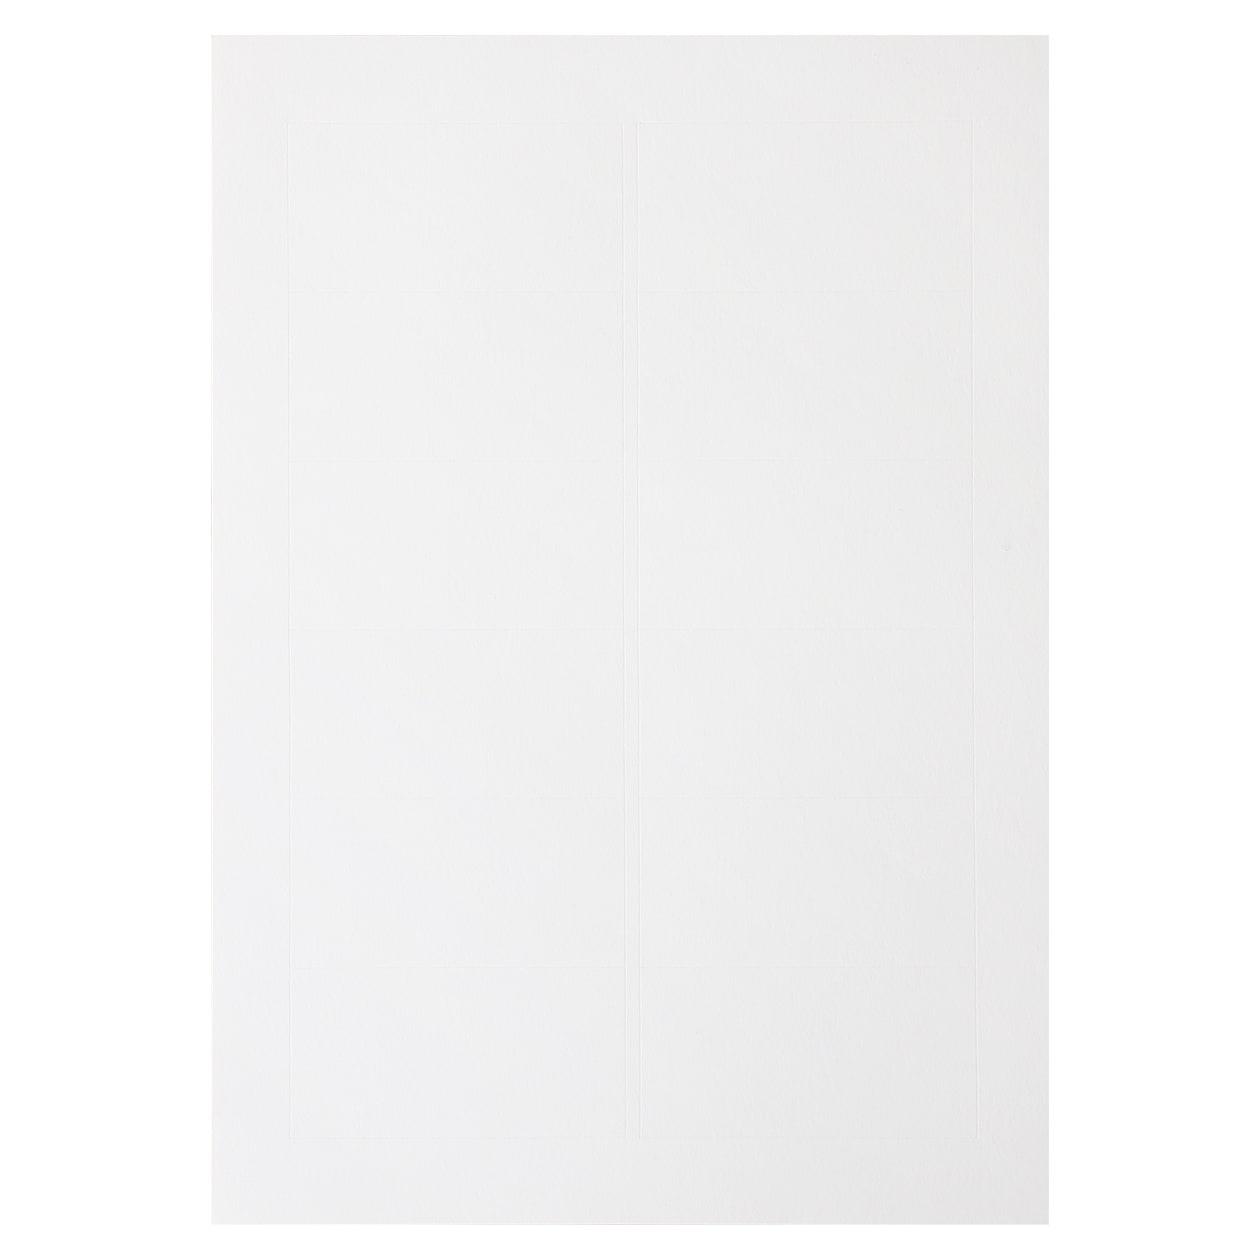 A4ラベル2×6面(83.8×42.3) コットン スノーホワイト